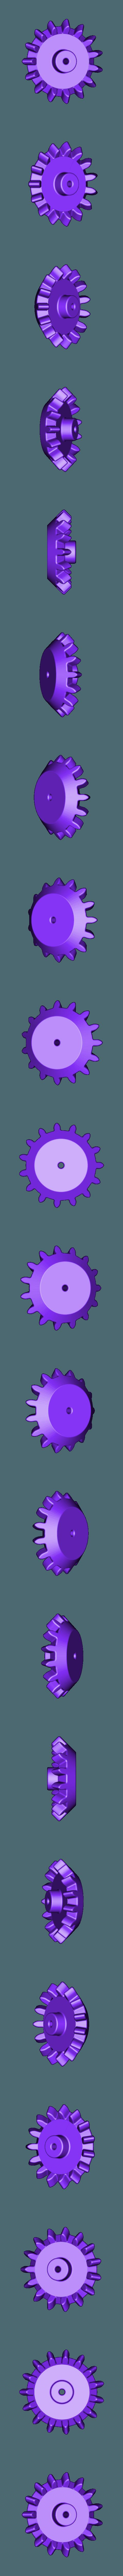 Bevel_gear_15T-R.stl Download free STL file Automata-4 Ben rides around the clock • 3D printer template, woodenclocks